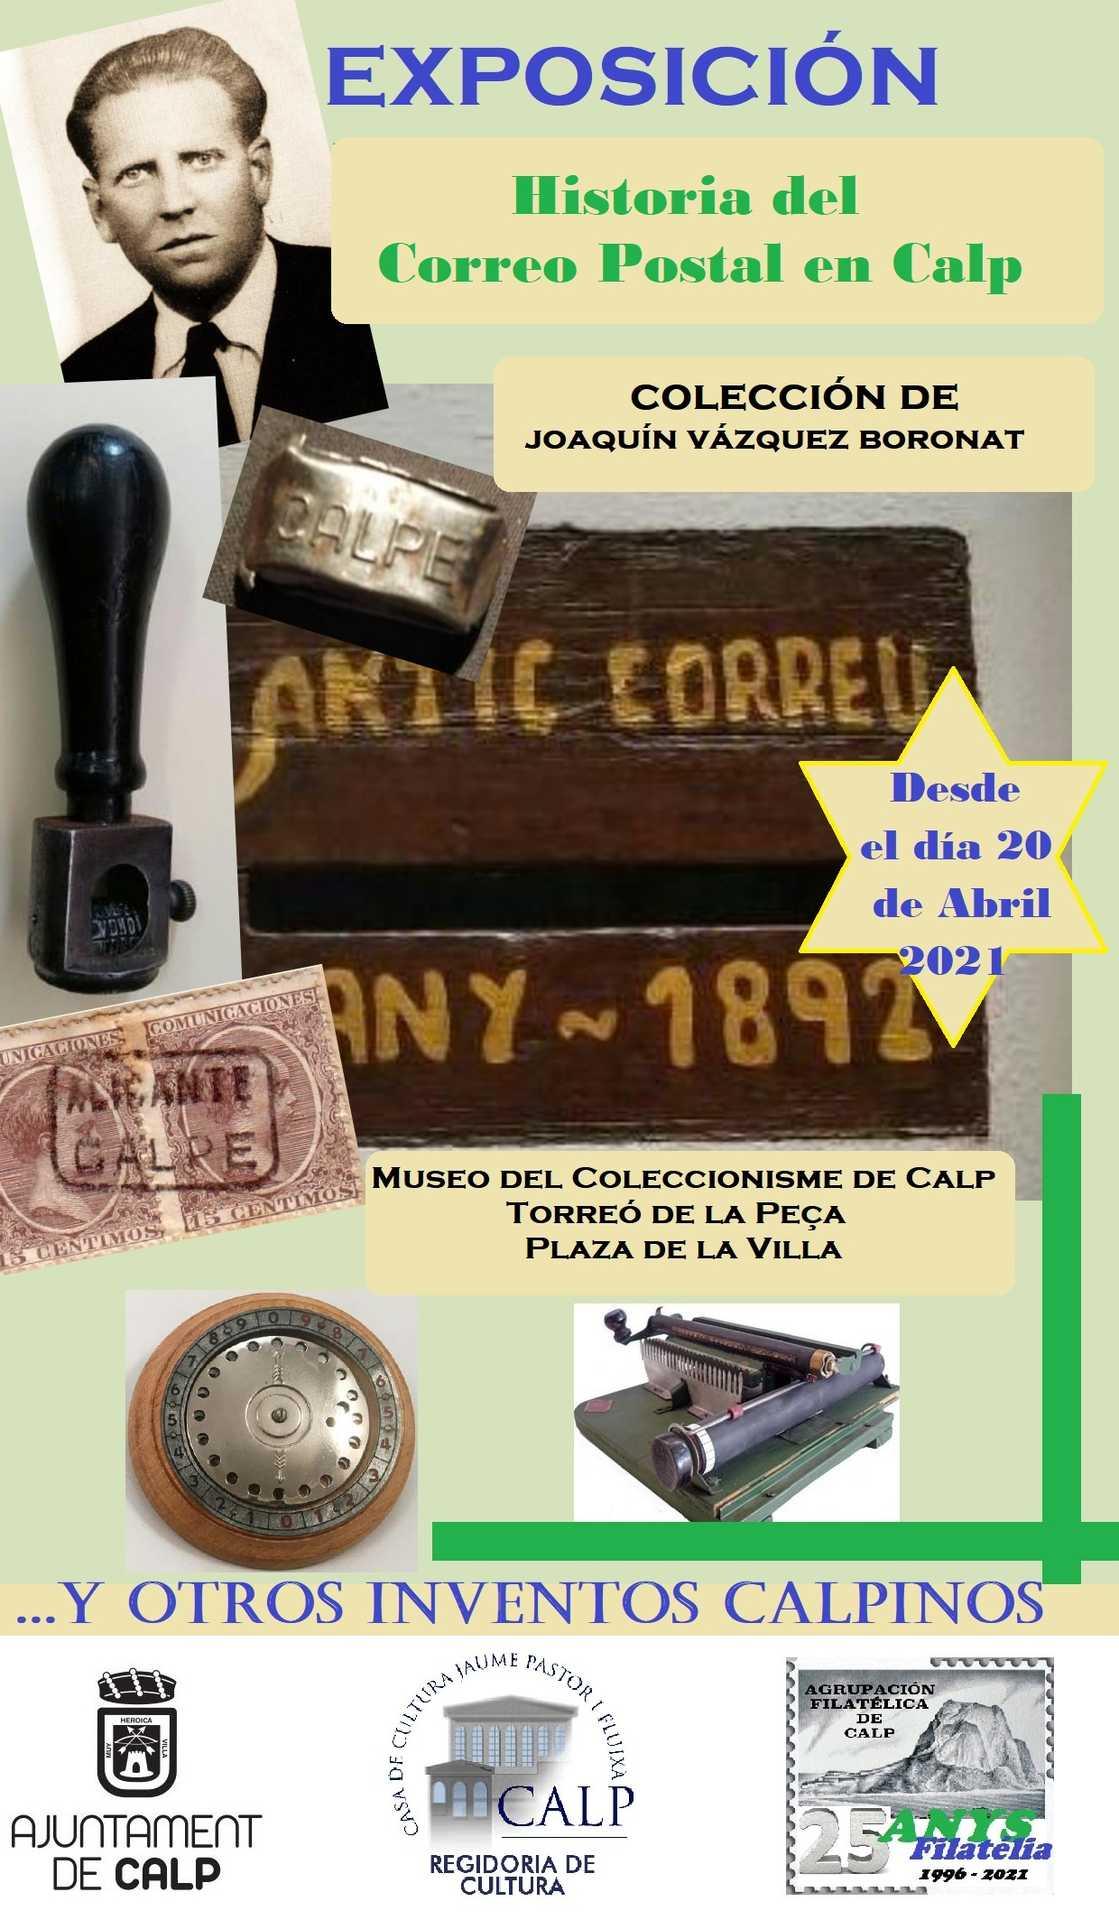 Historia del Correo Postal en Calp. Colección de Joaquín Vázquez Boronat